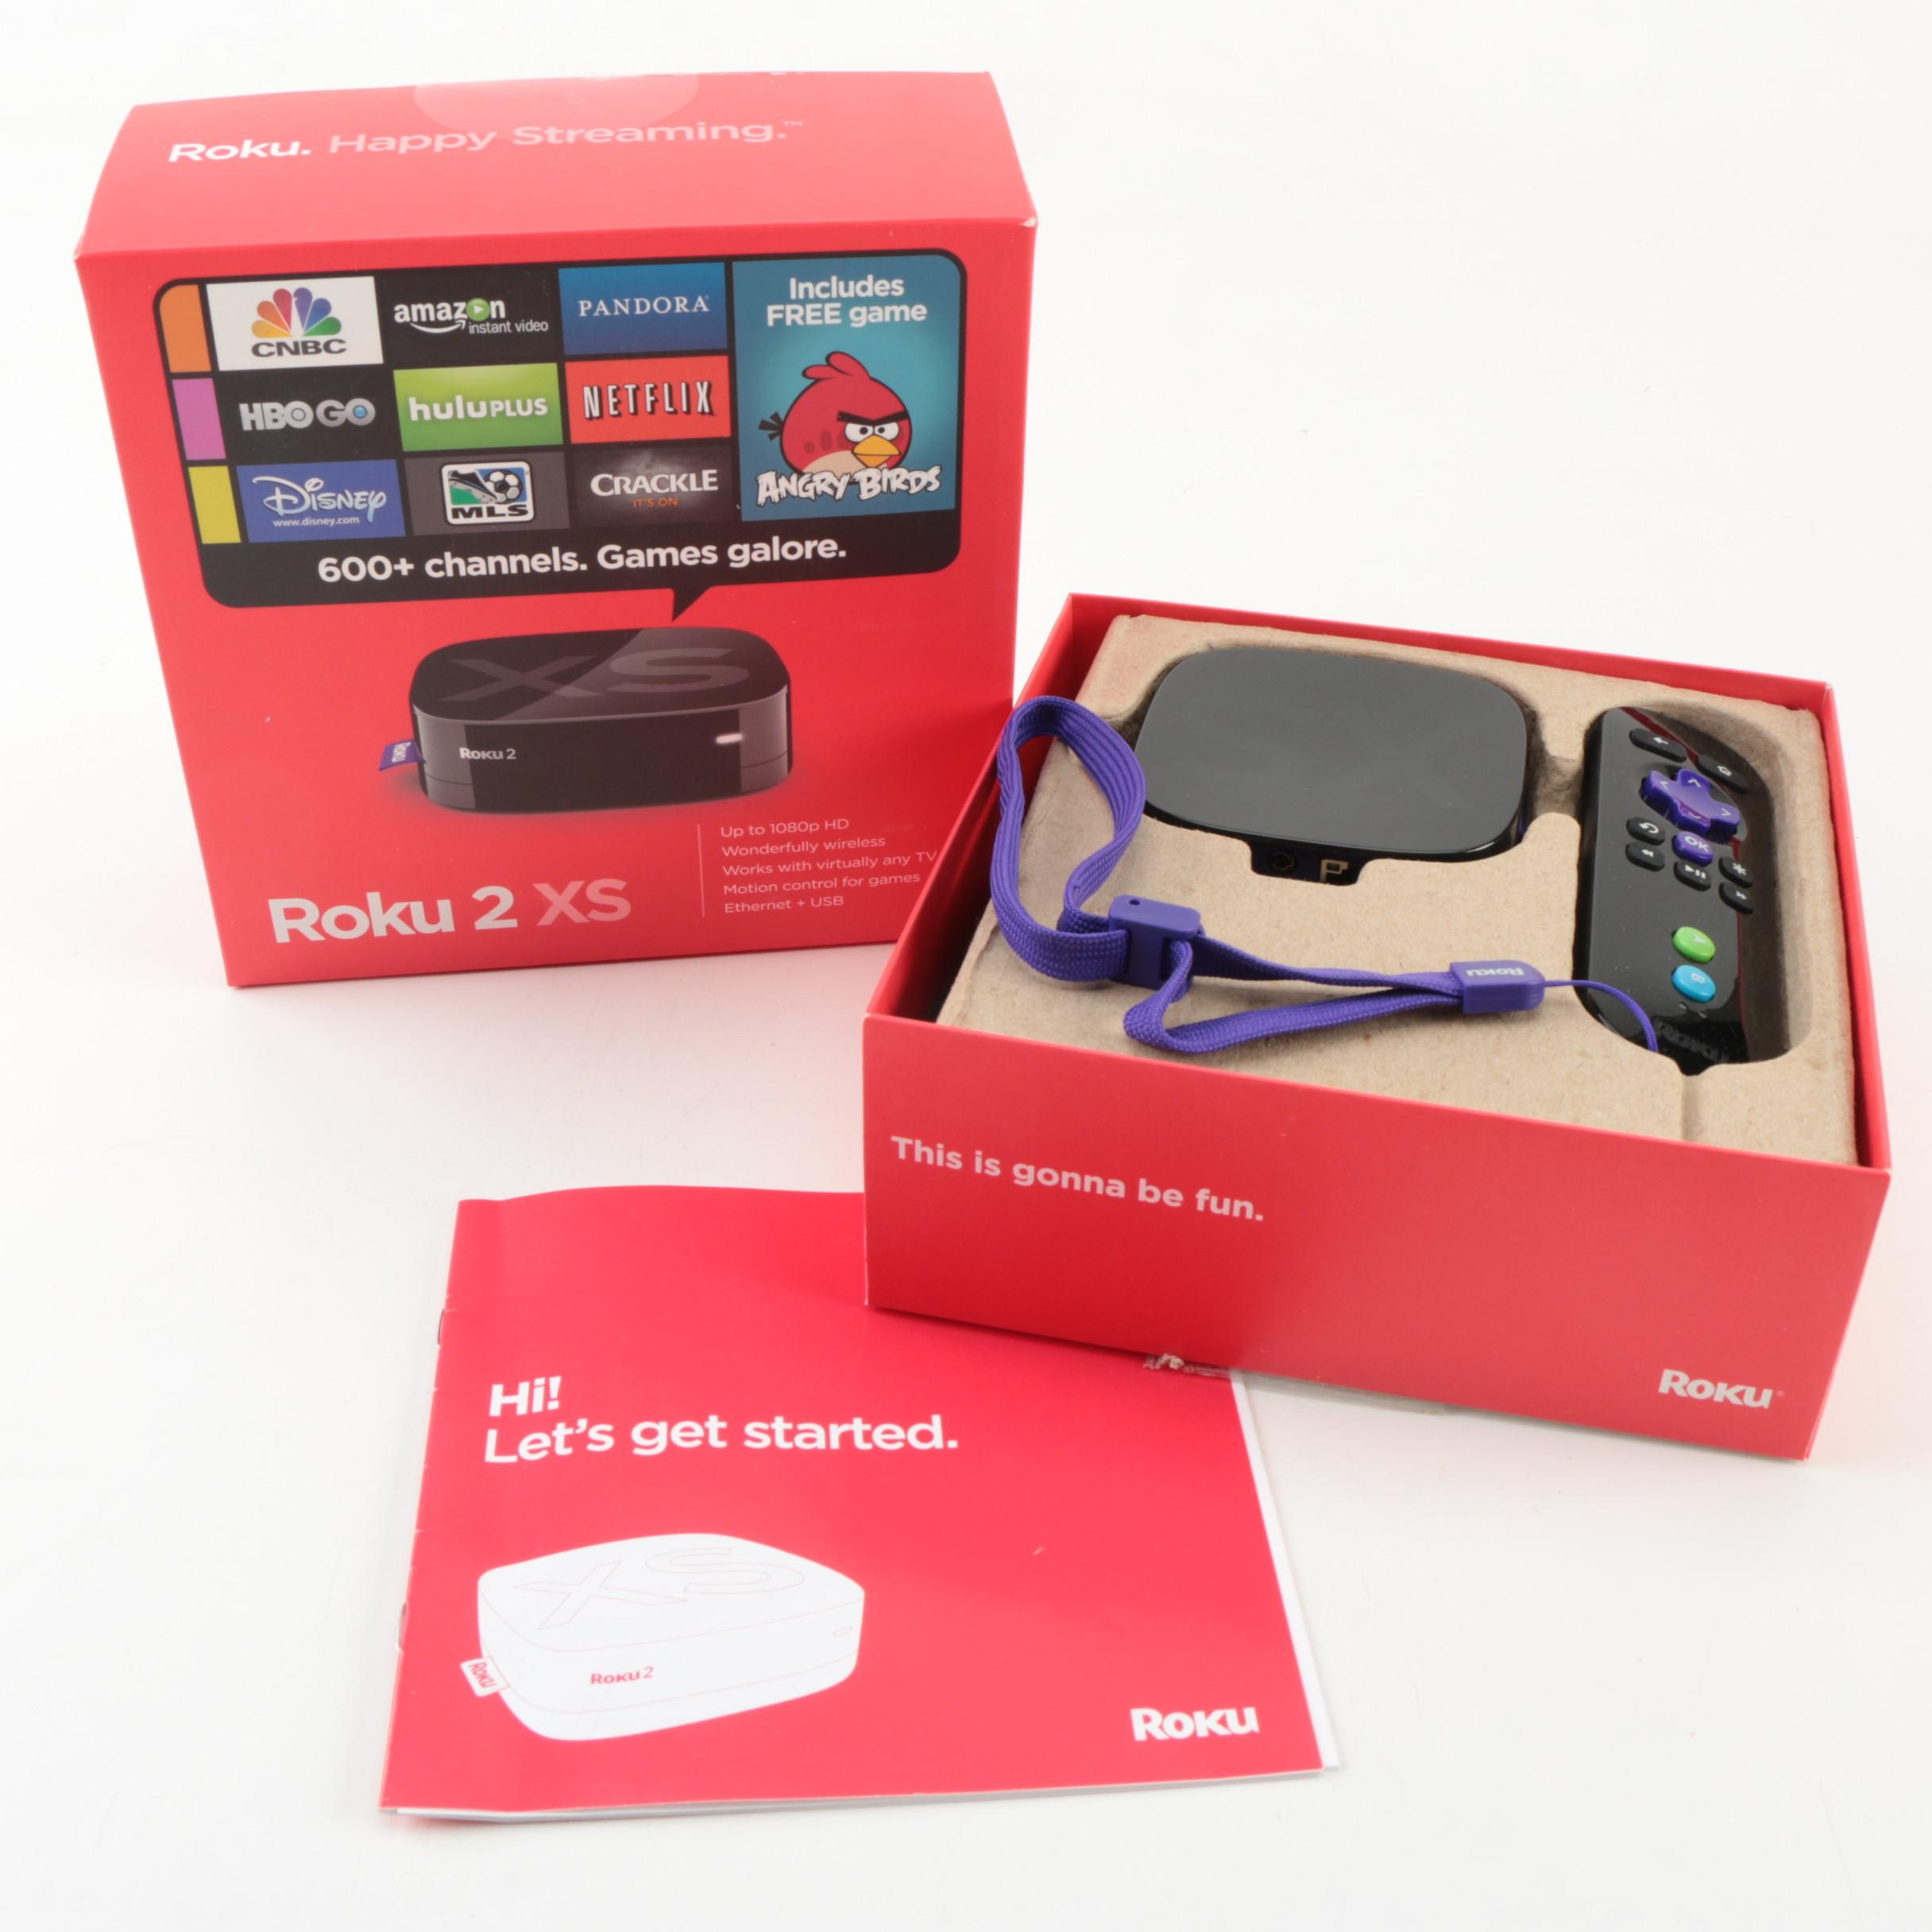 Roku 2 XS Streaming Device